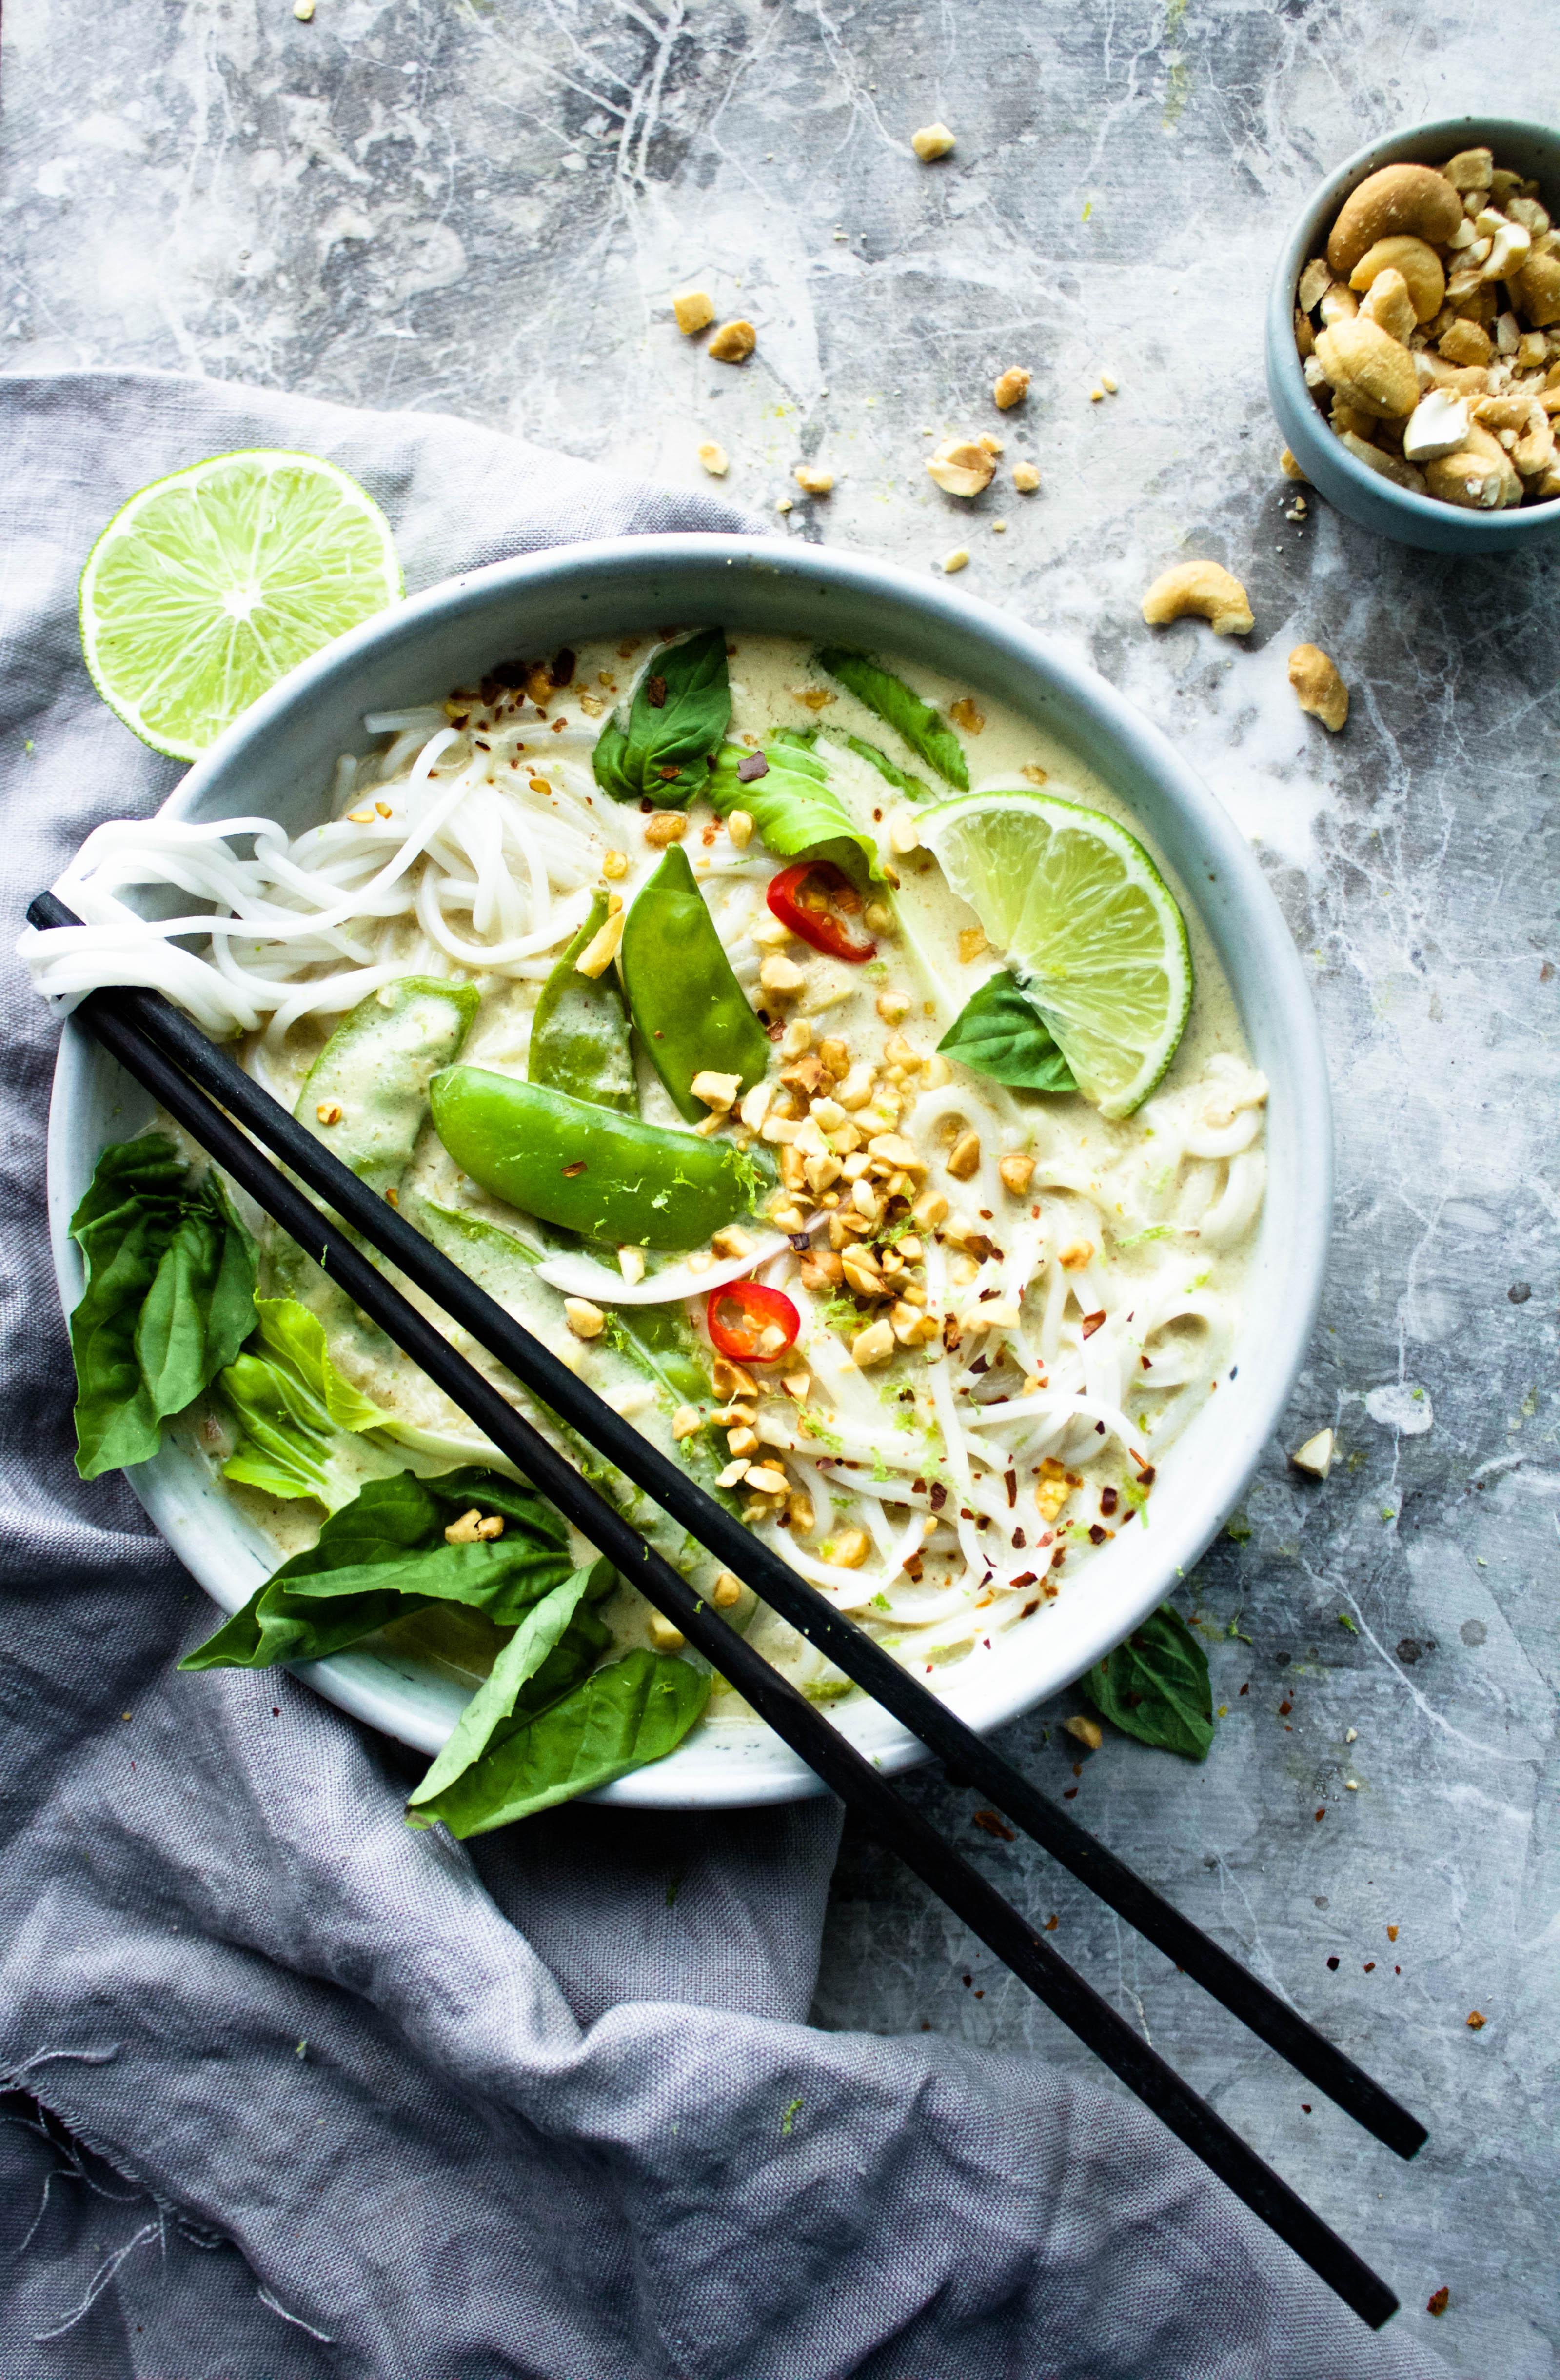 The Creamiest Vegan Thai Green Curry | Earth & Oven